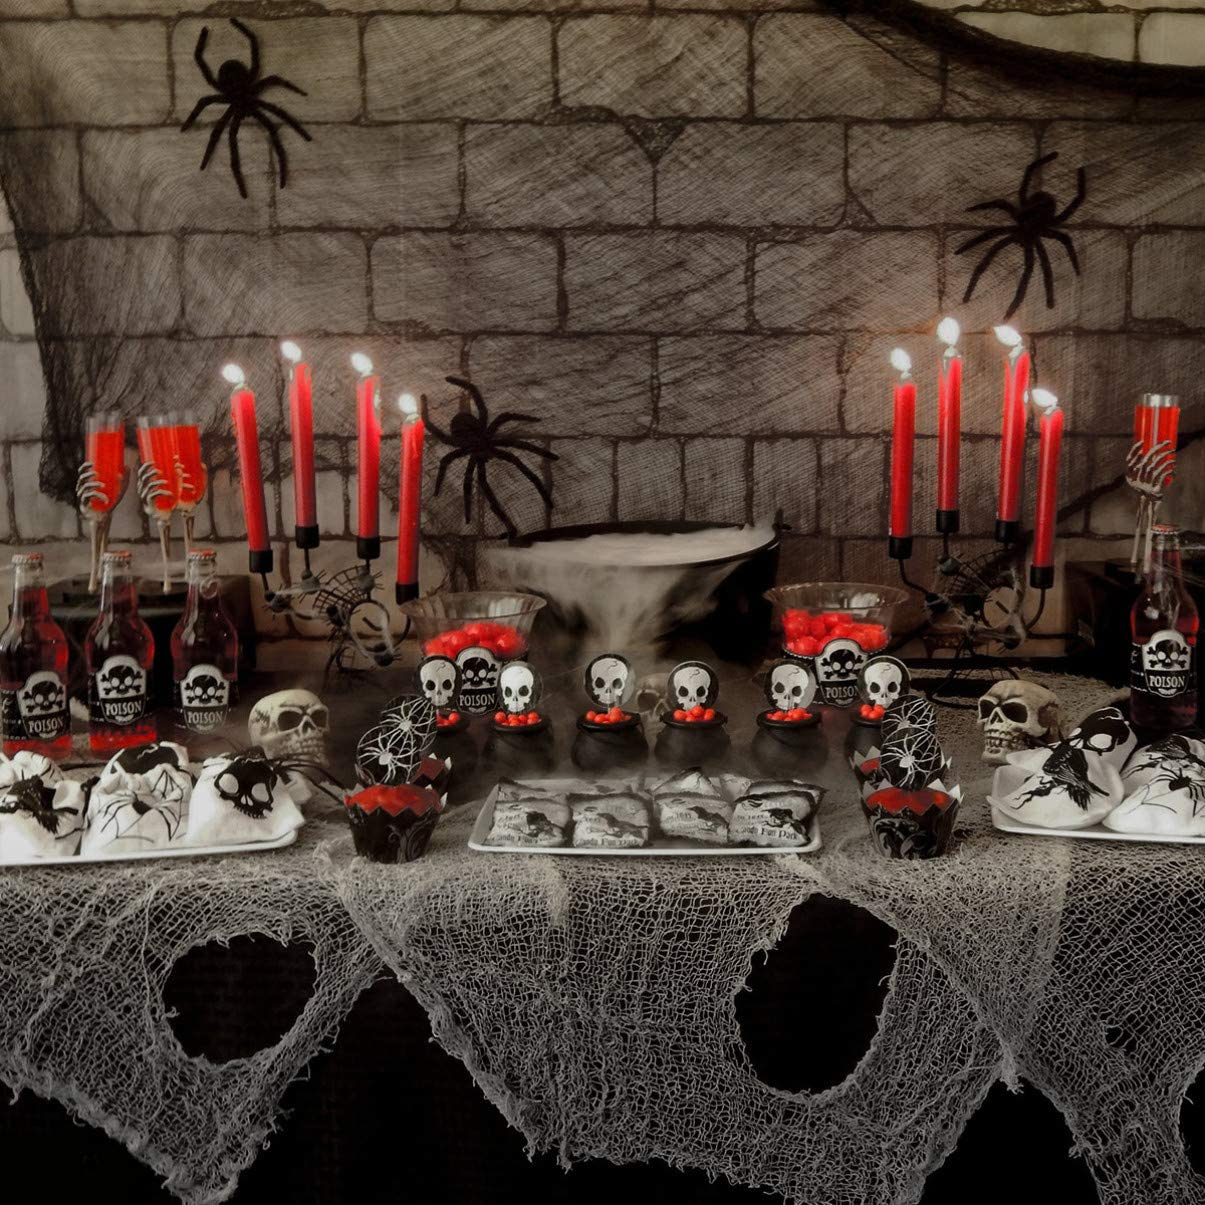 Halloween Creepy Cloth Cotton Creepy Gauze Cloth Spooky Halloween Fabric Halloween Gauze Decoration 3 Pcs, Grey